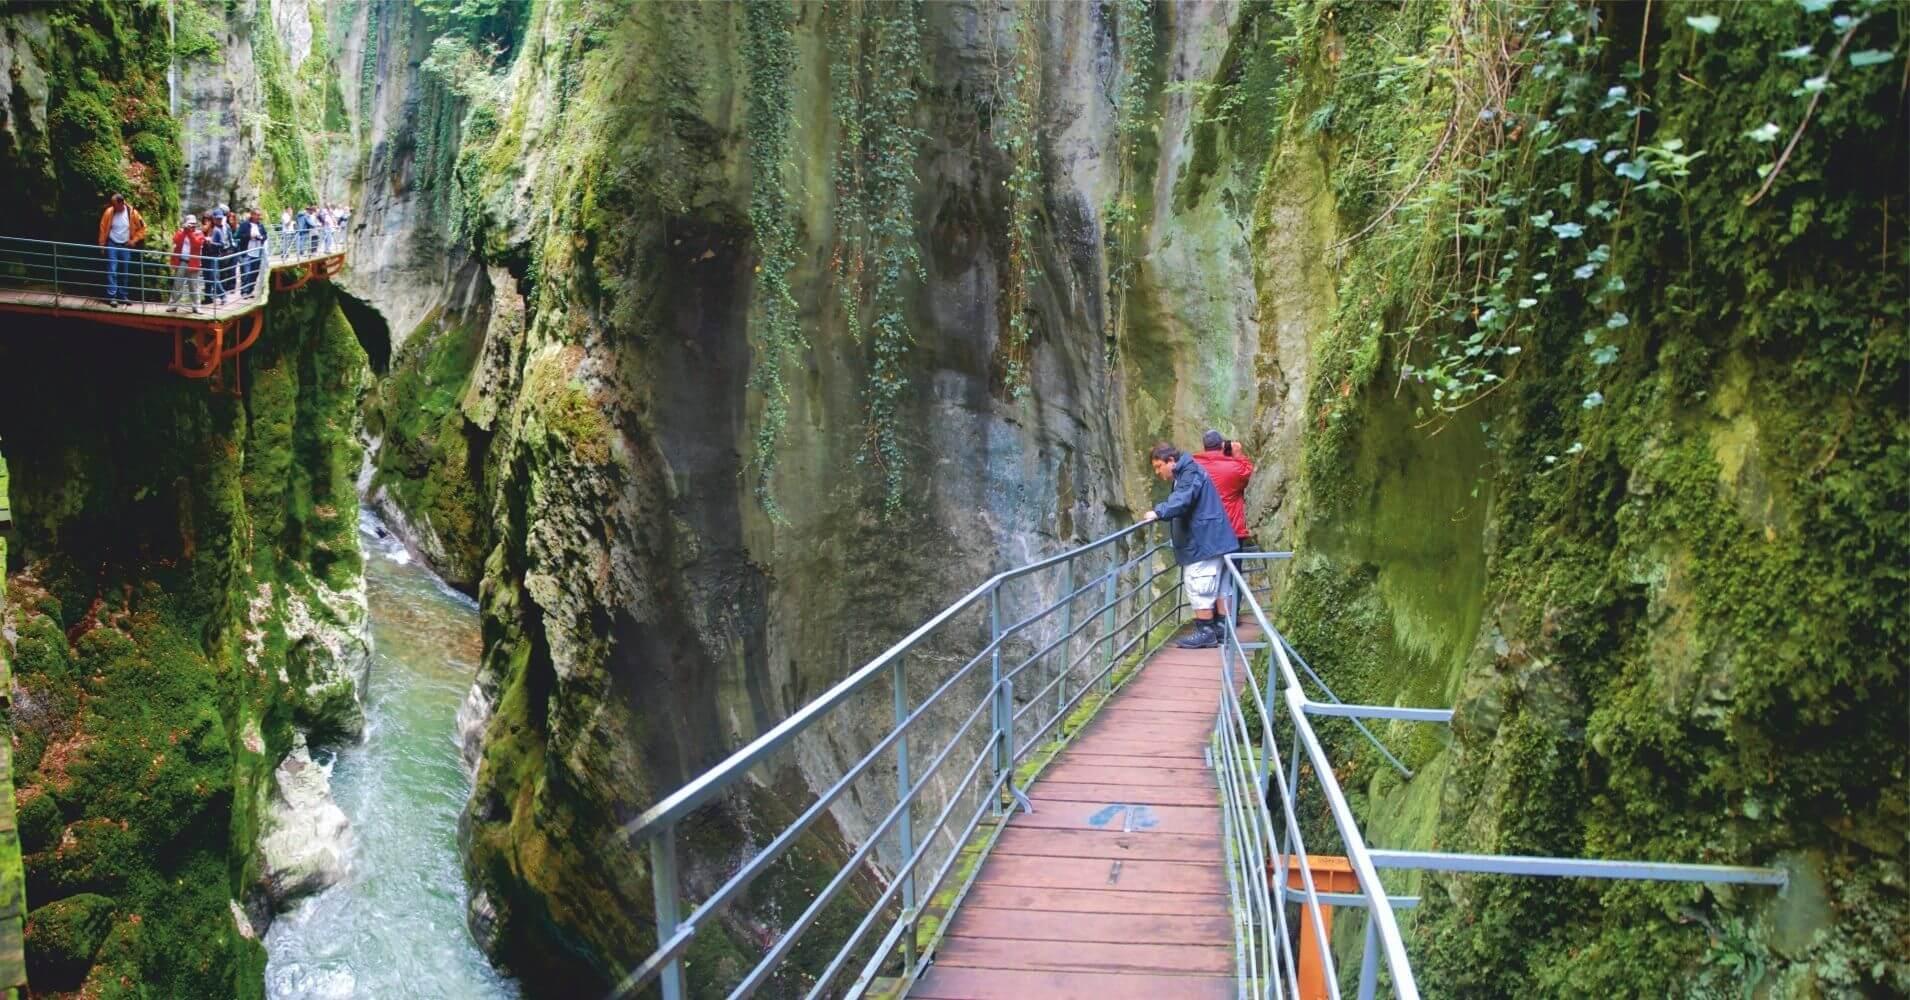 Les Gorges du Fier. Lovagni, Alta Saboya. Auvernia-Ródano-Alpes, Francia.